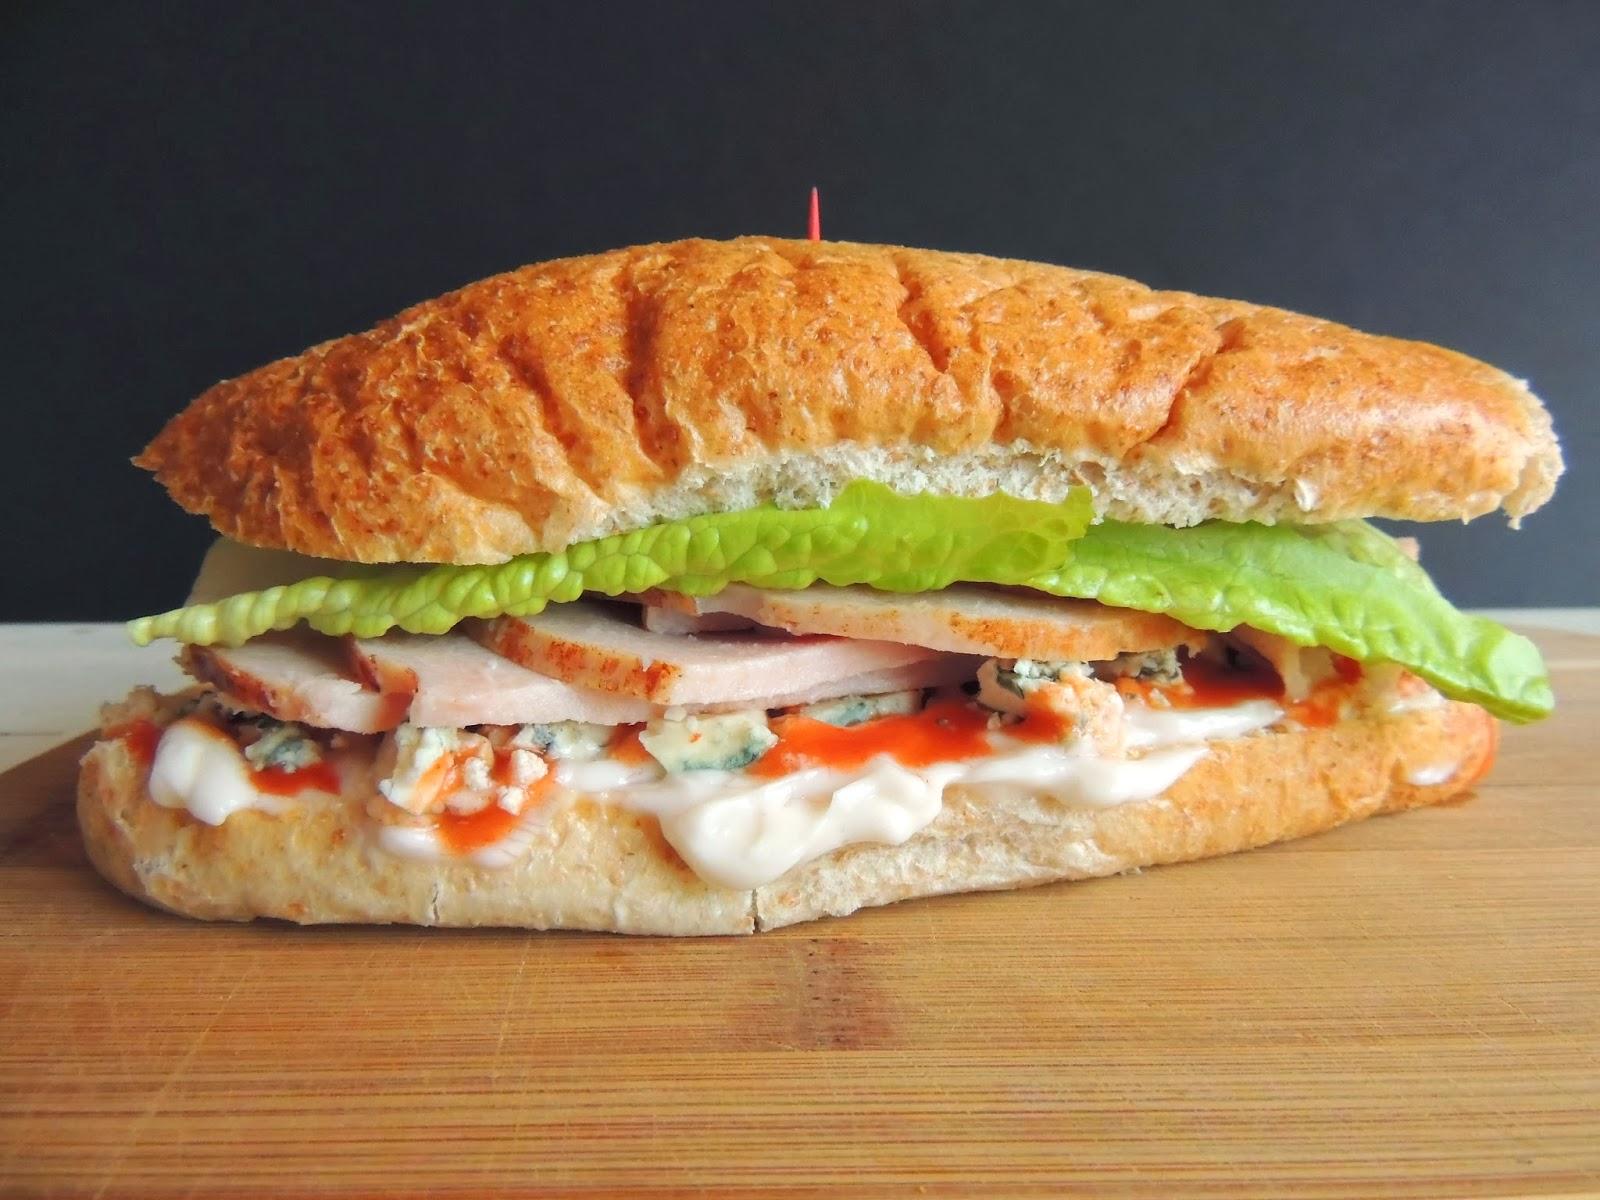 ... Plate: Thanksgiving Leftovers - Buffalo Blue Cheese Turkey Sandwich